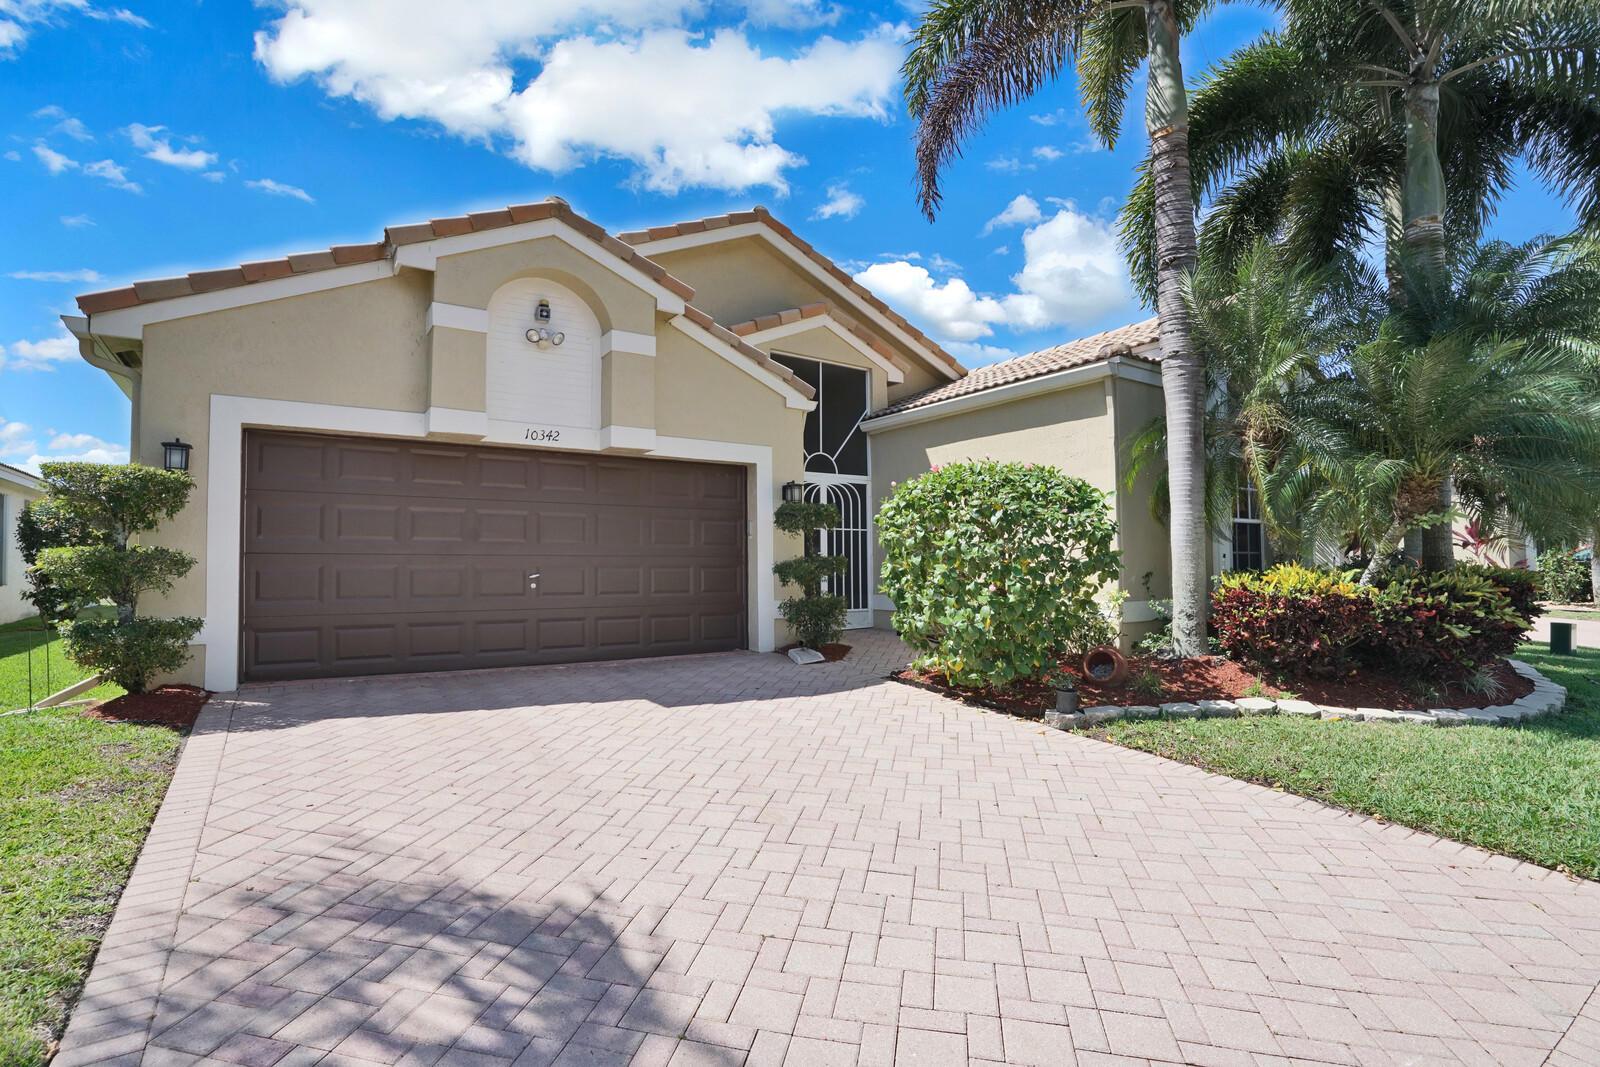 10342 Utopia Circle  Boynton Beach FL 33437